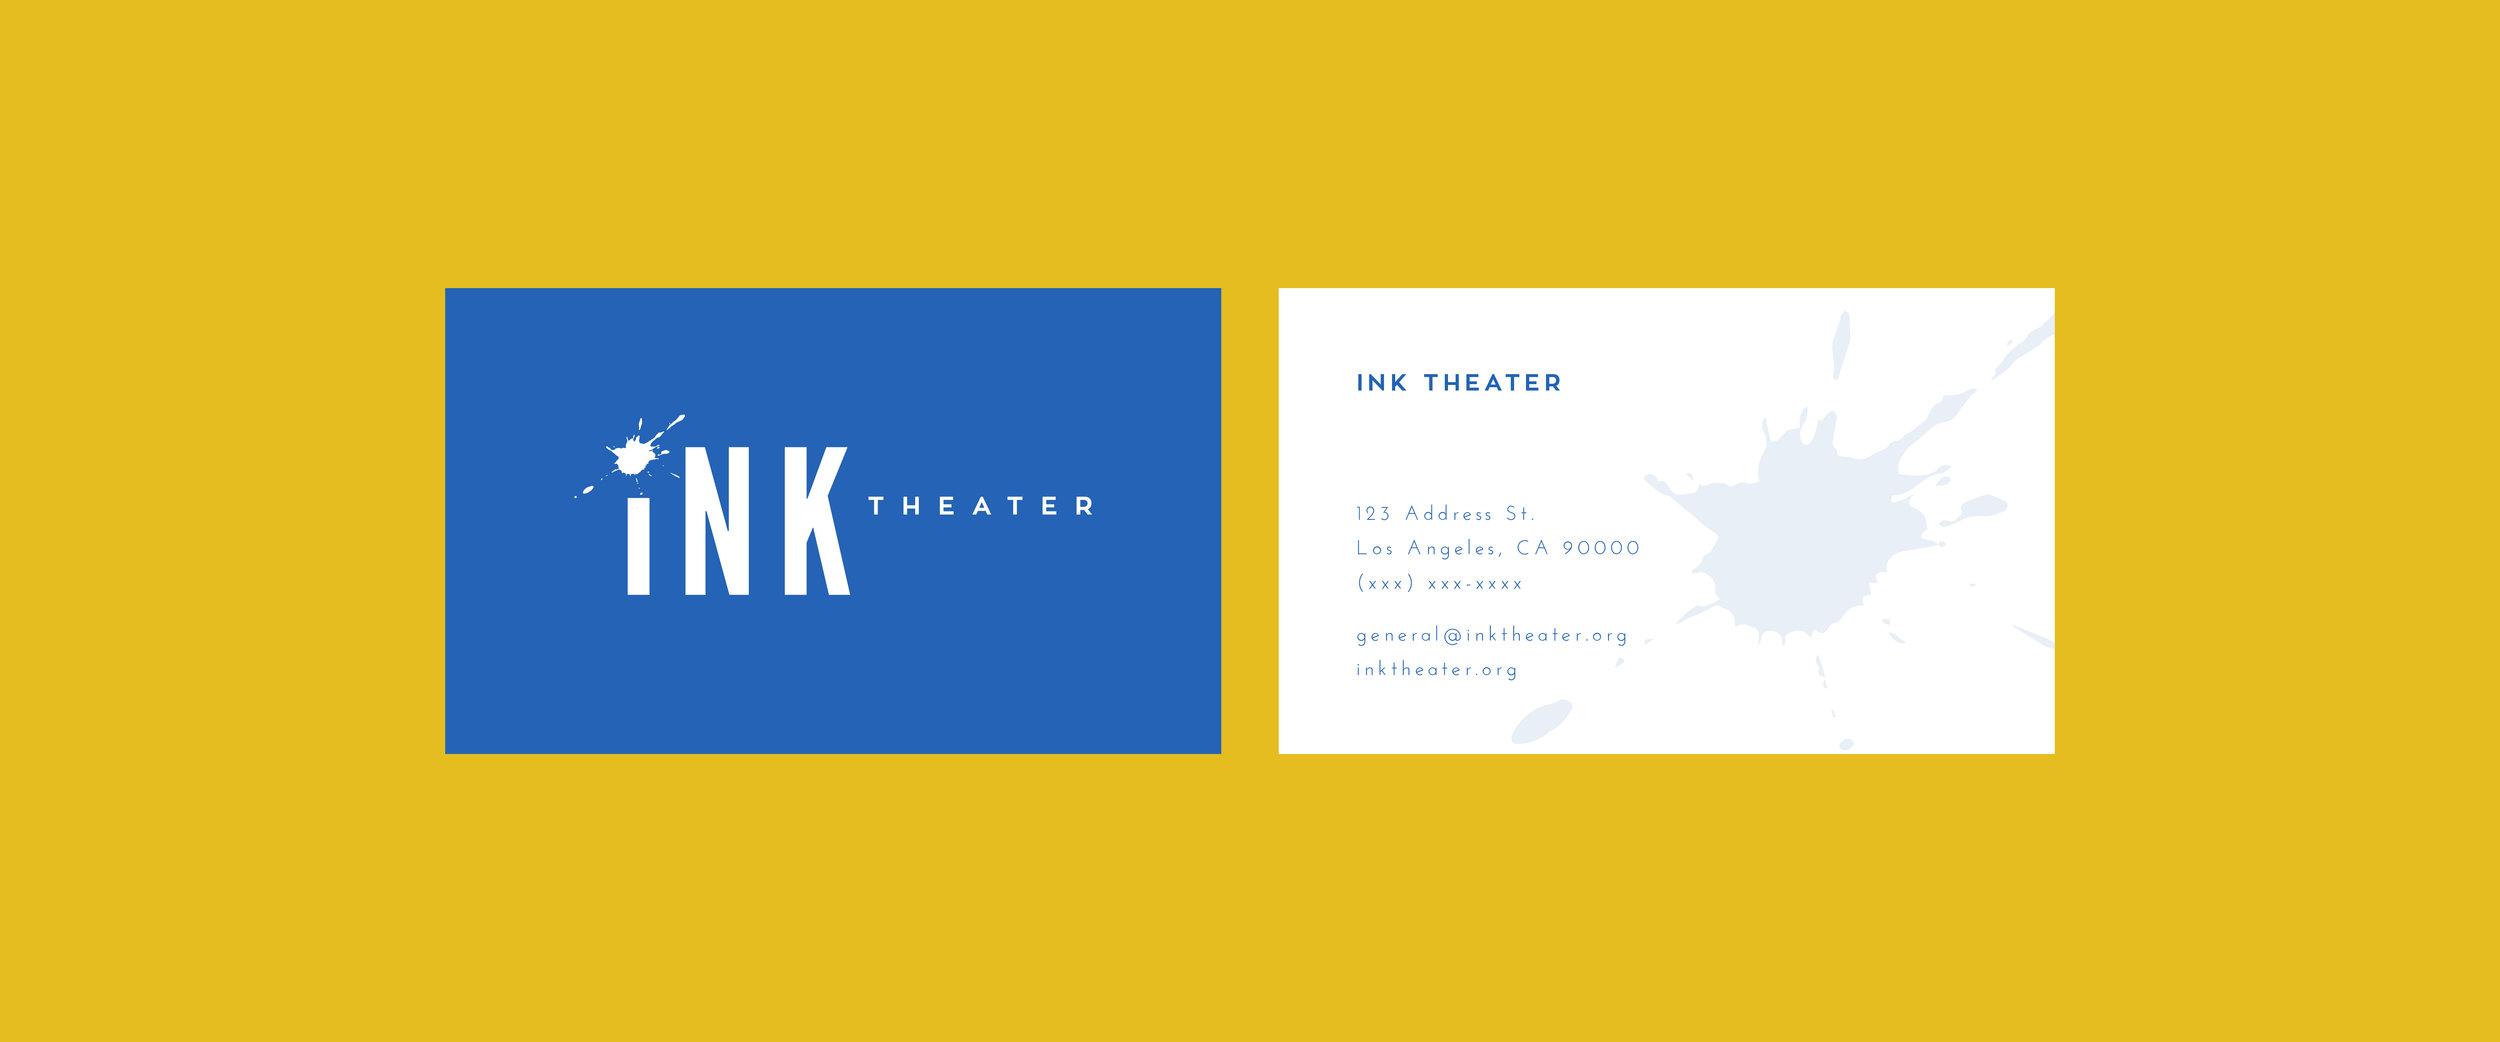 CANOPY_Ink Theater_Branding_Business Card Design.jpg